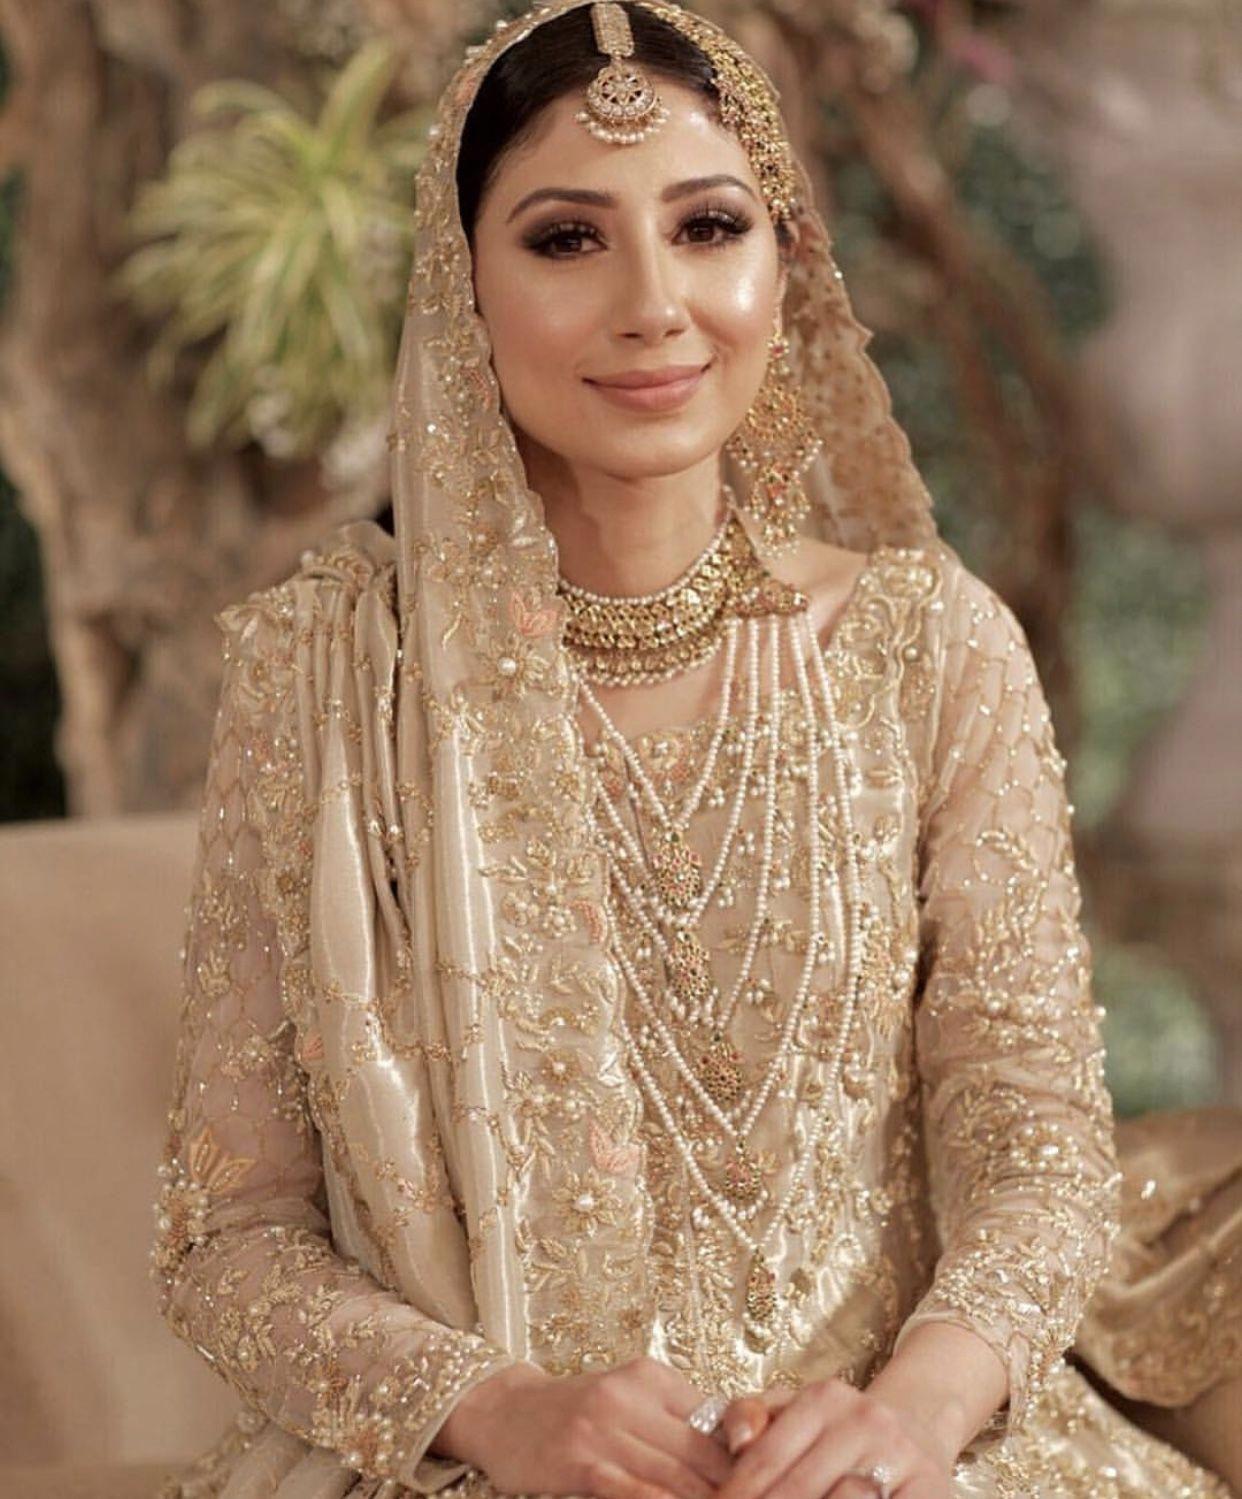 Hairstyle Girl Jora: Desi Wedding Dresses, Pakistani